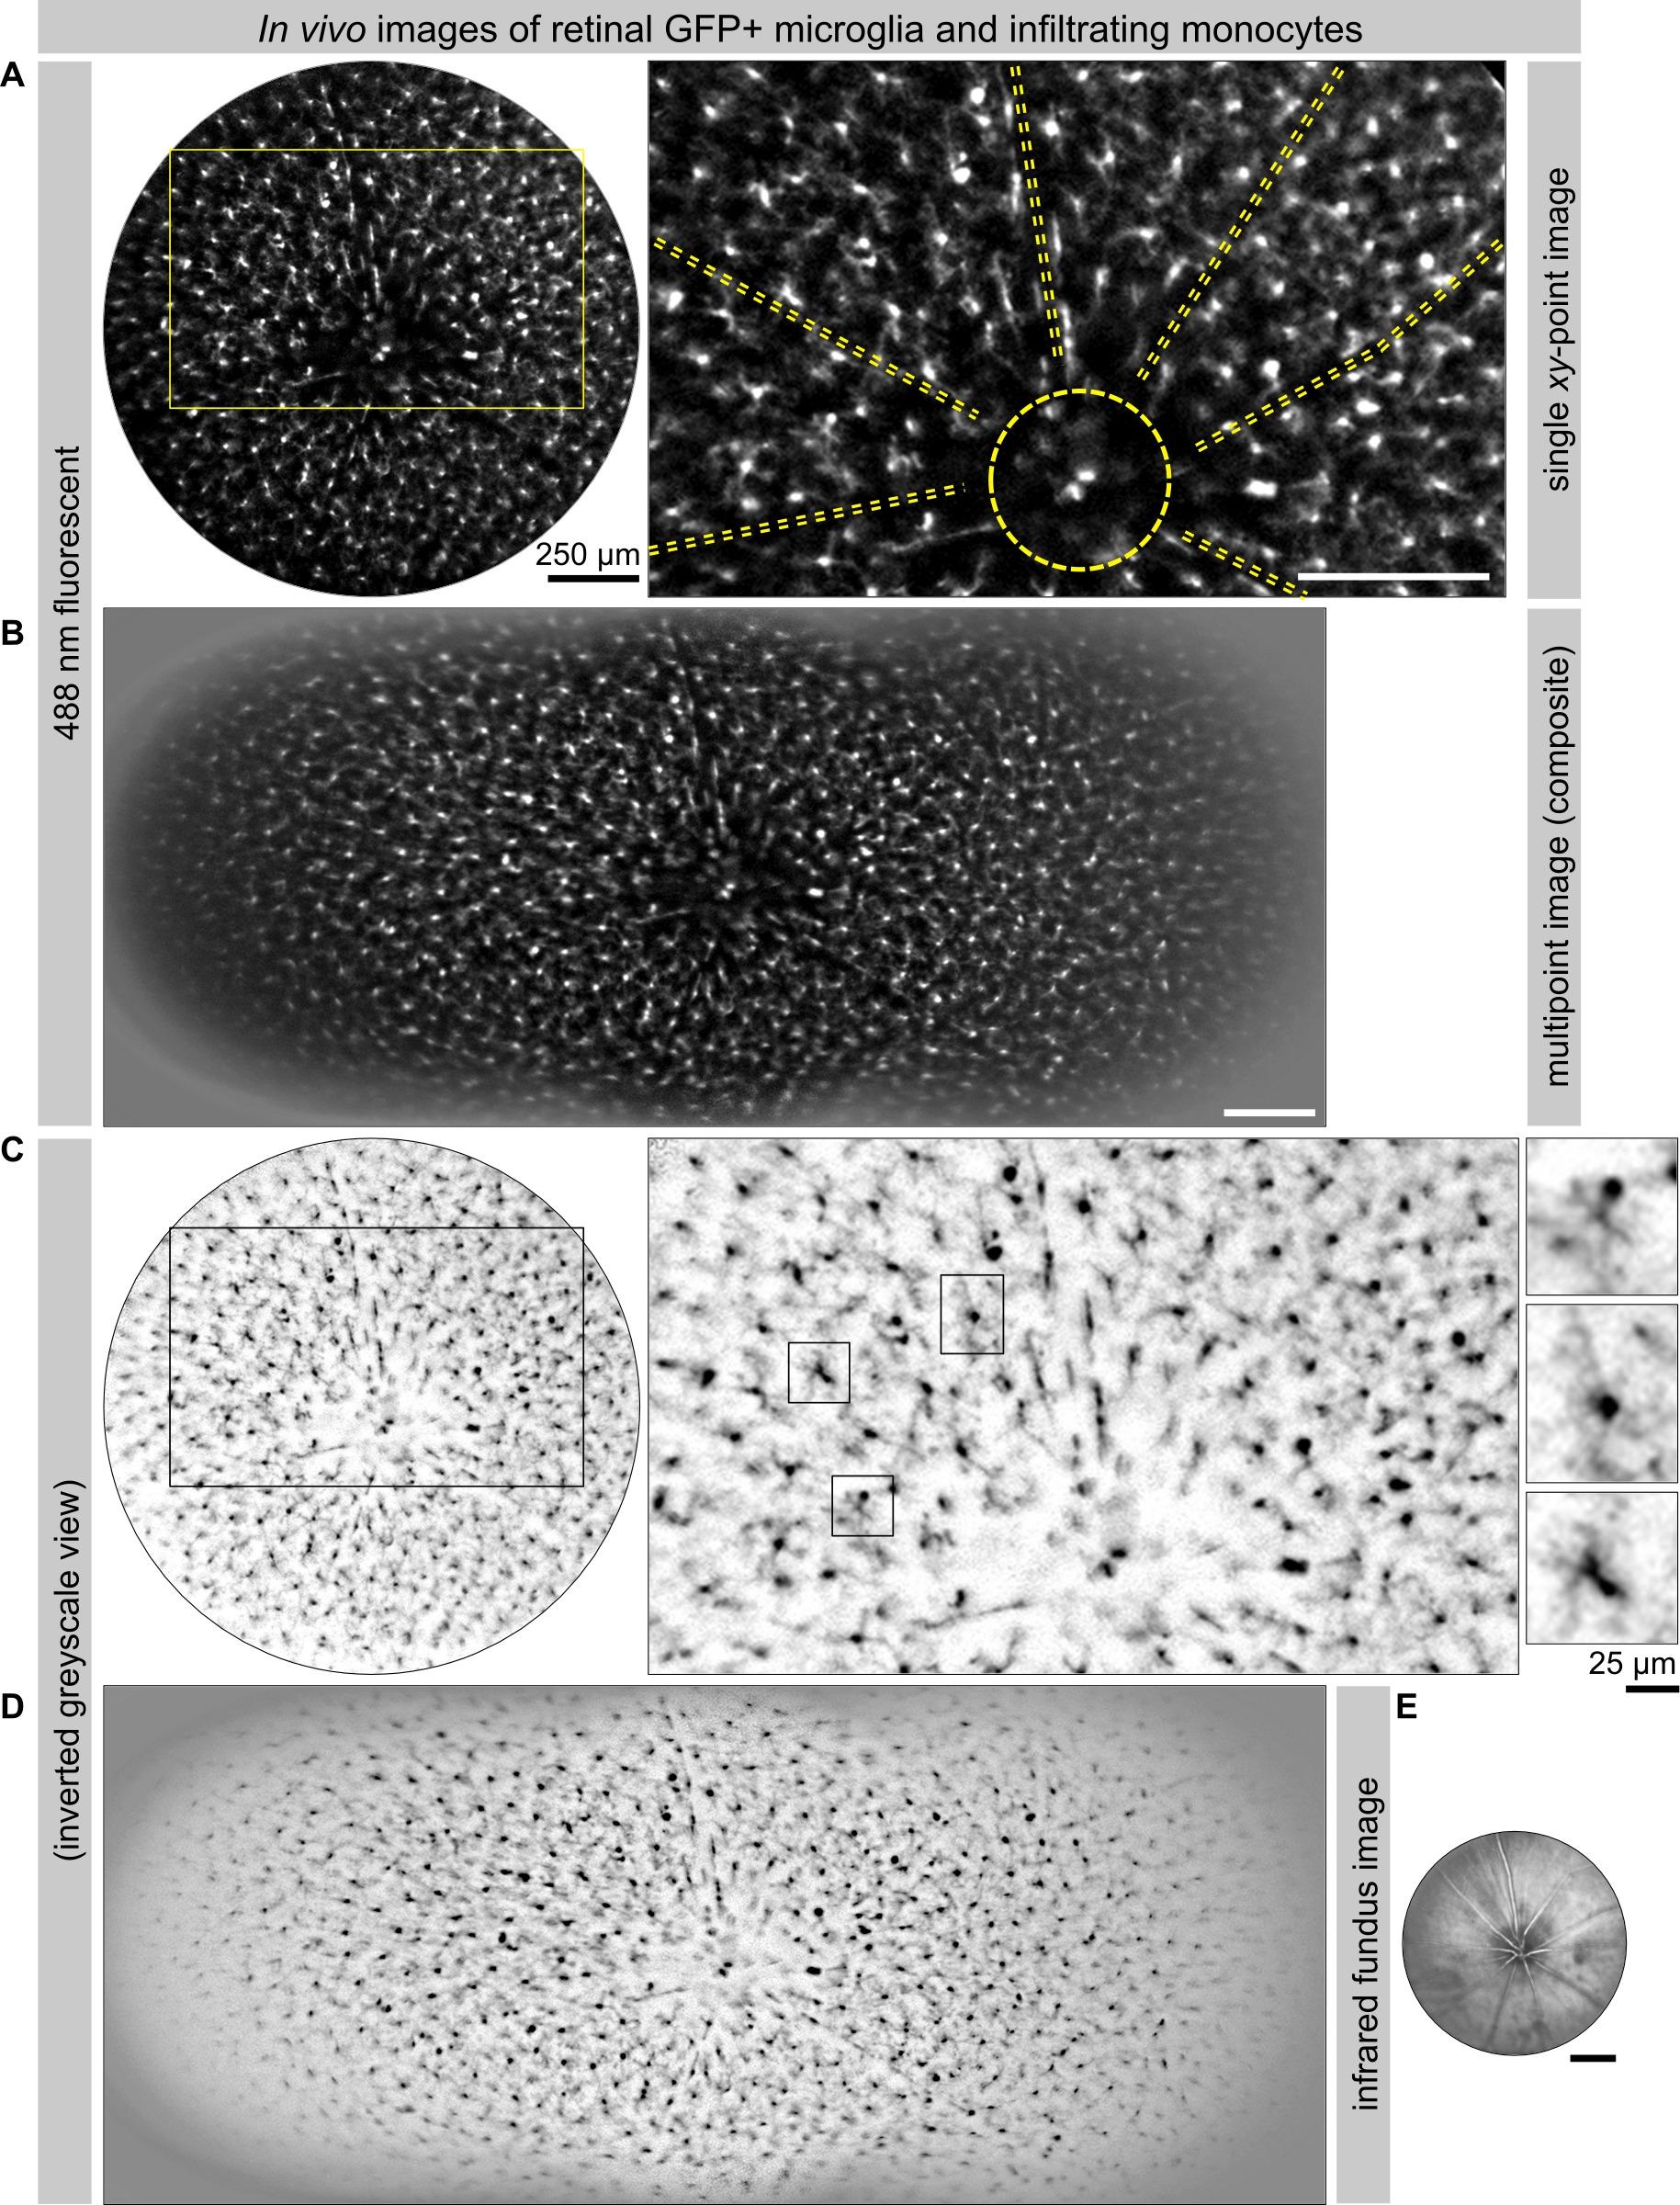 1c94b9319 الشكل 5: عالية الدقة تصور CX3CR1- GFP + الخلايا الدبقية الصغيرة / المترجمة  حيدات لشبكية العين الماوس الداخلية التي كتبها متحد البؤر الحية التصوير  الضوئي ...